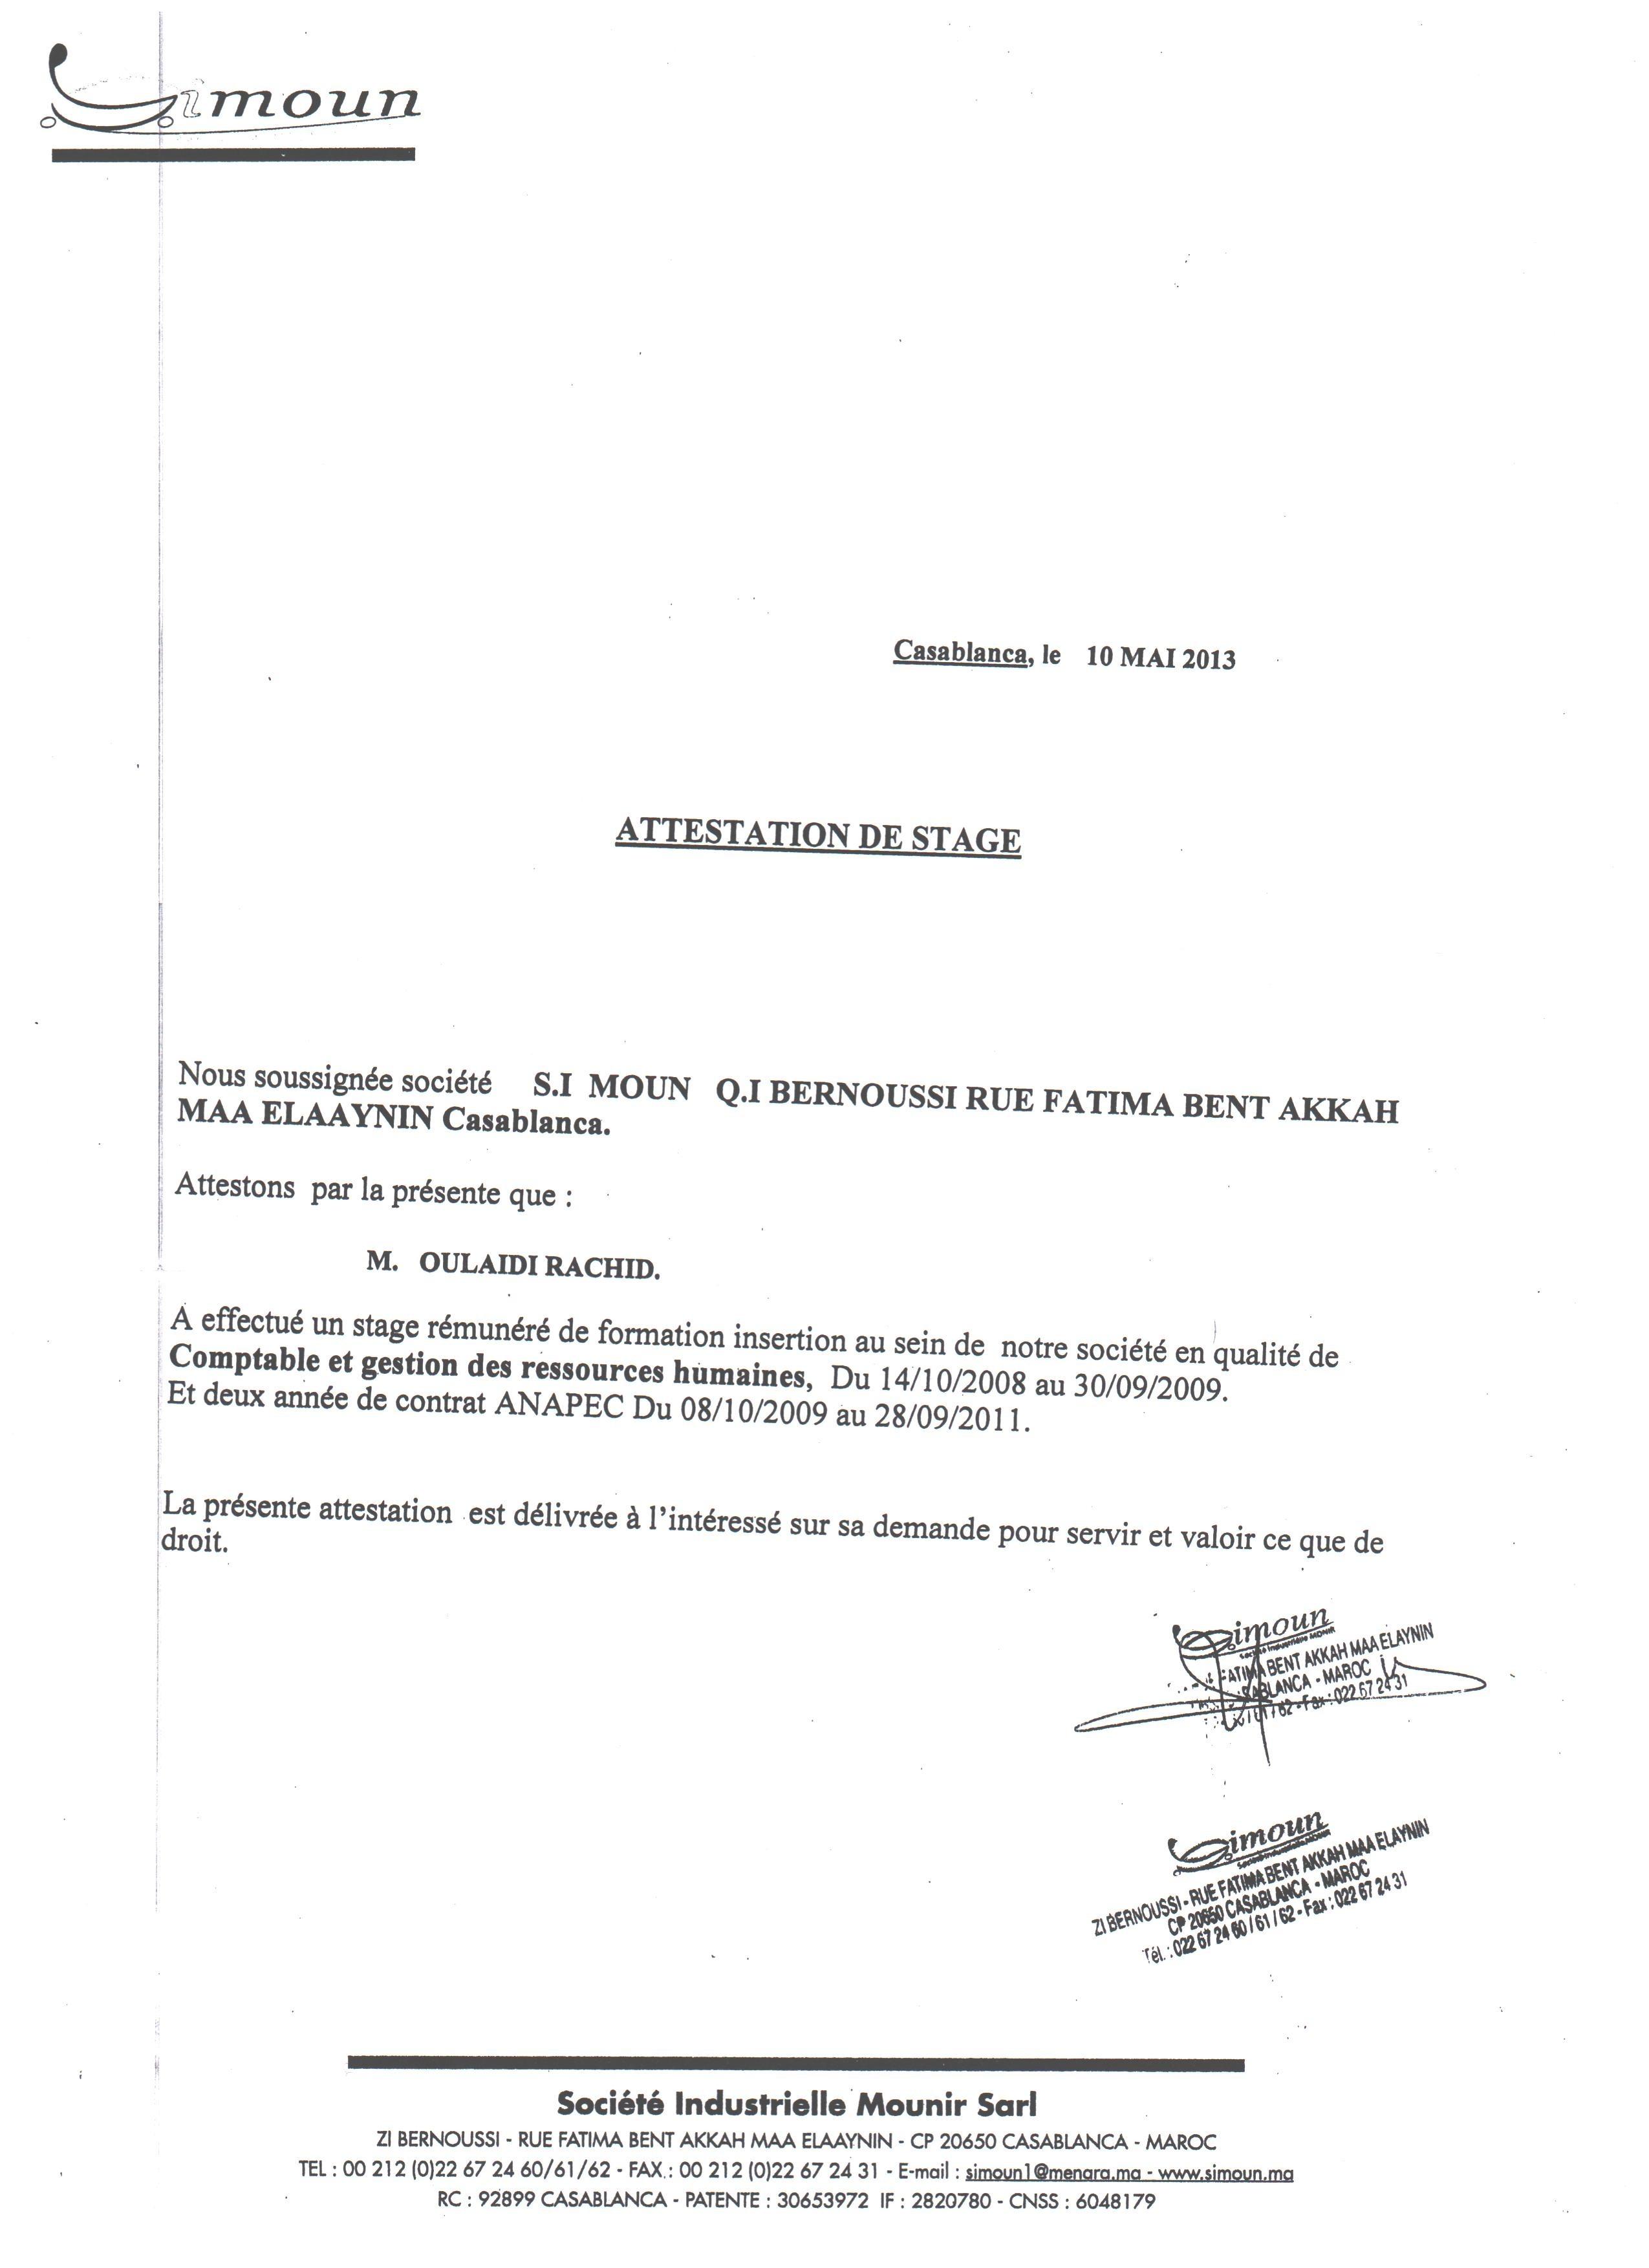 Preavis Contrat Anapec Maroc Vinny Oleo Vegetal Info